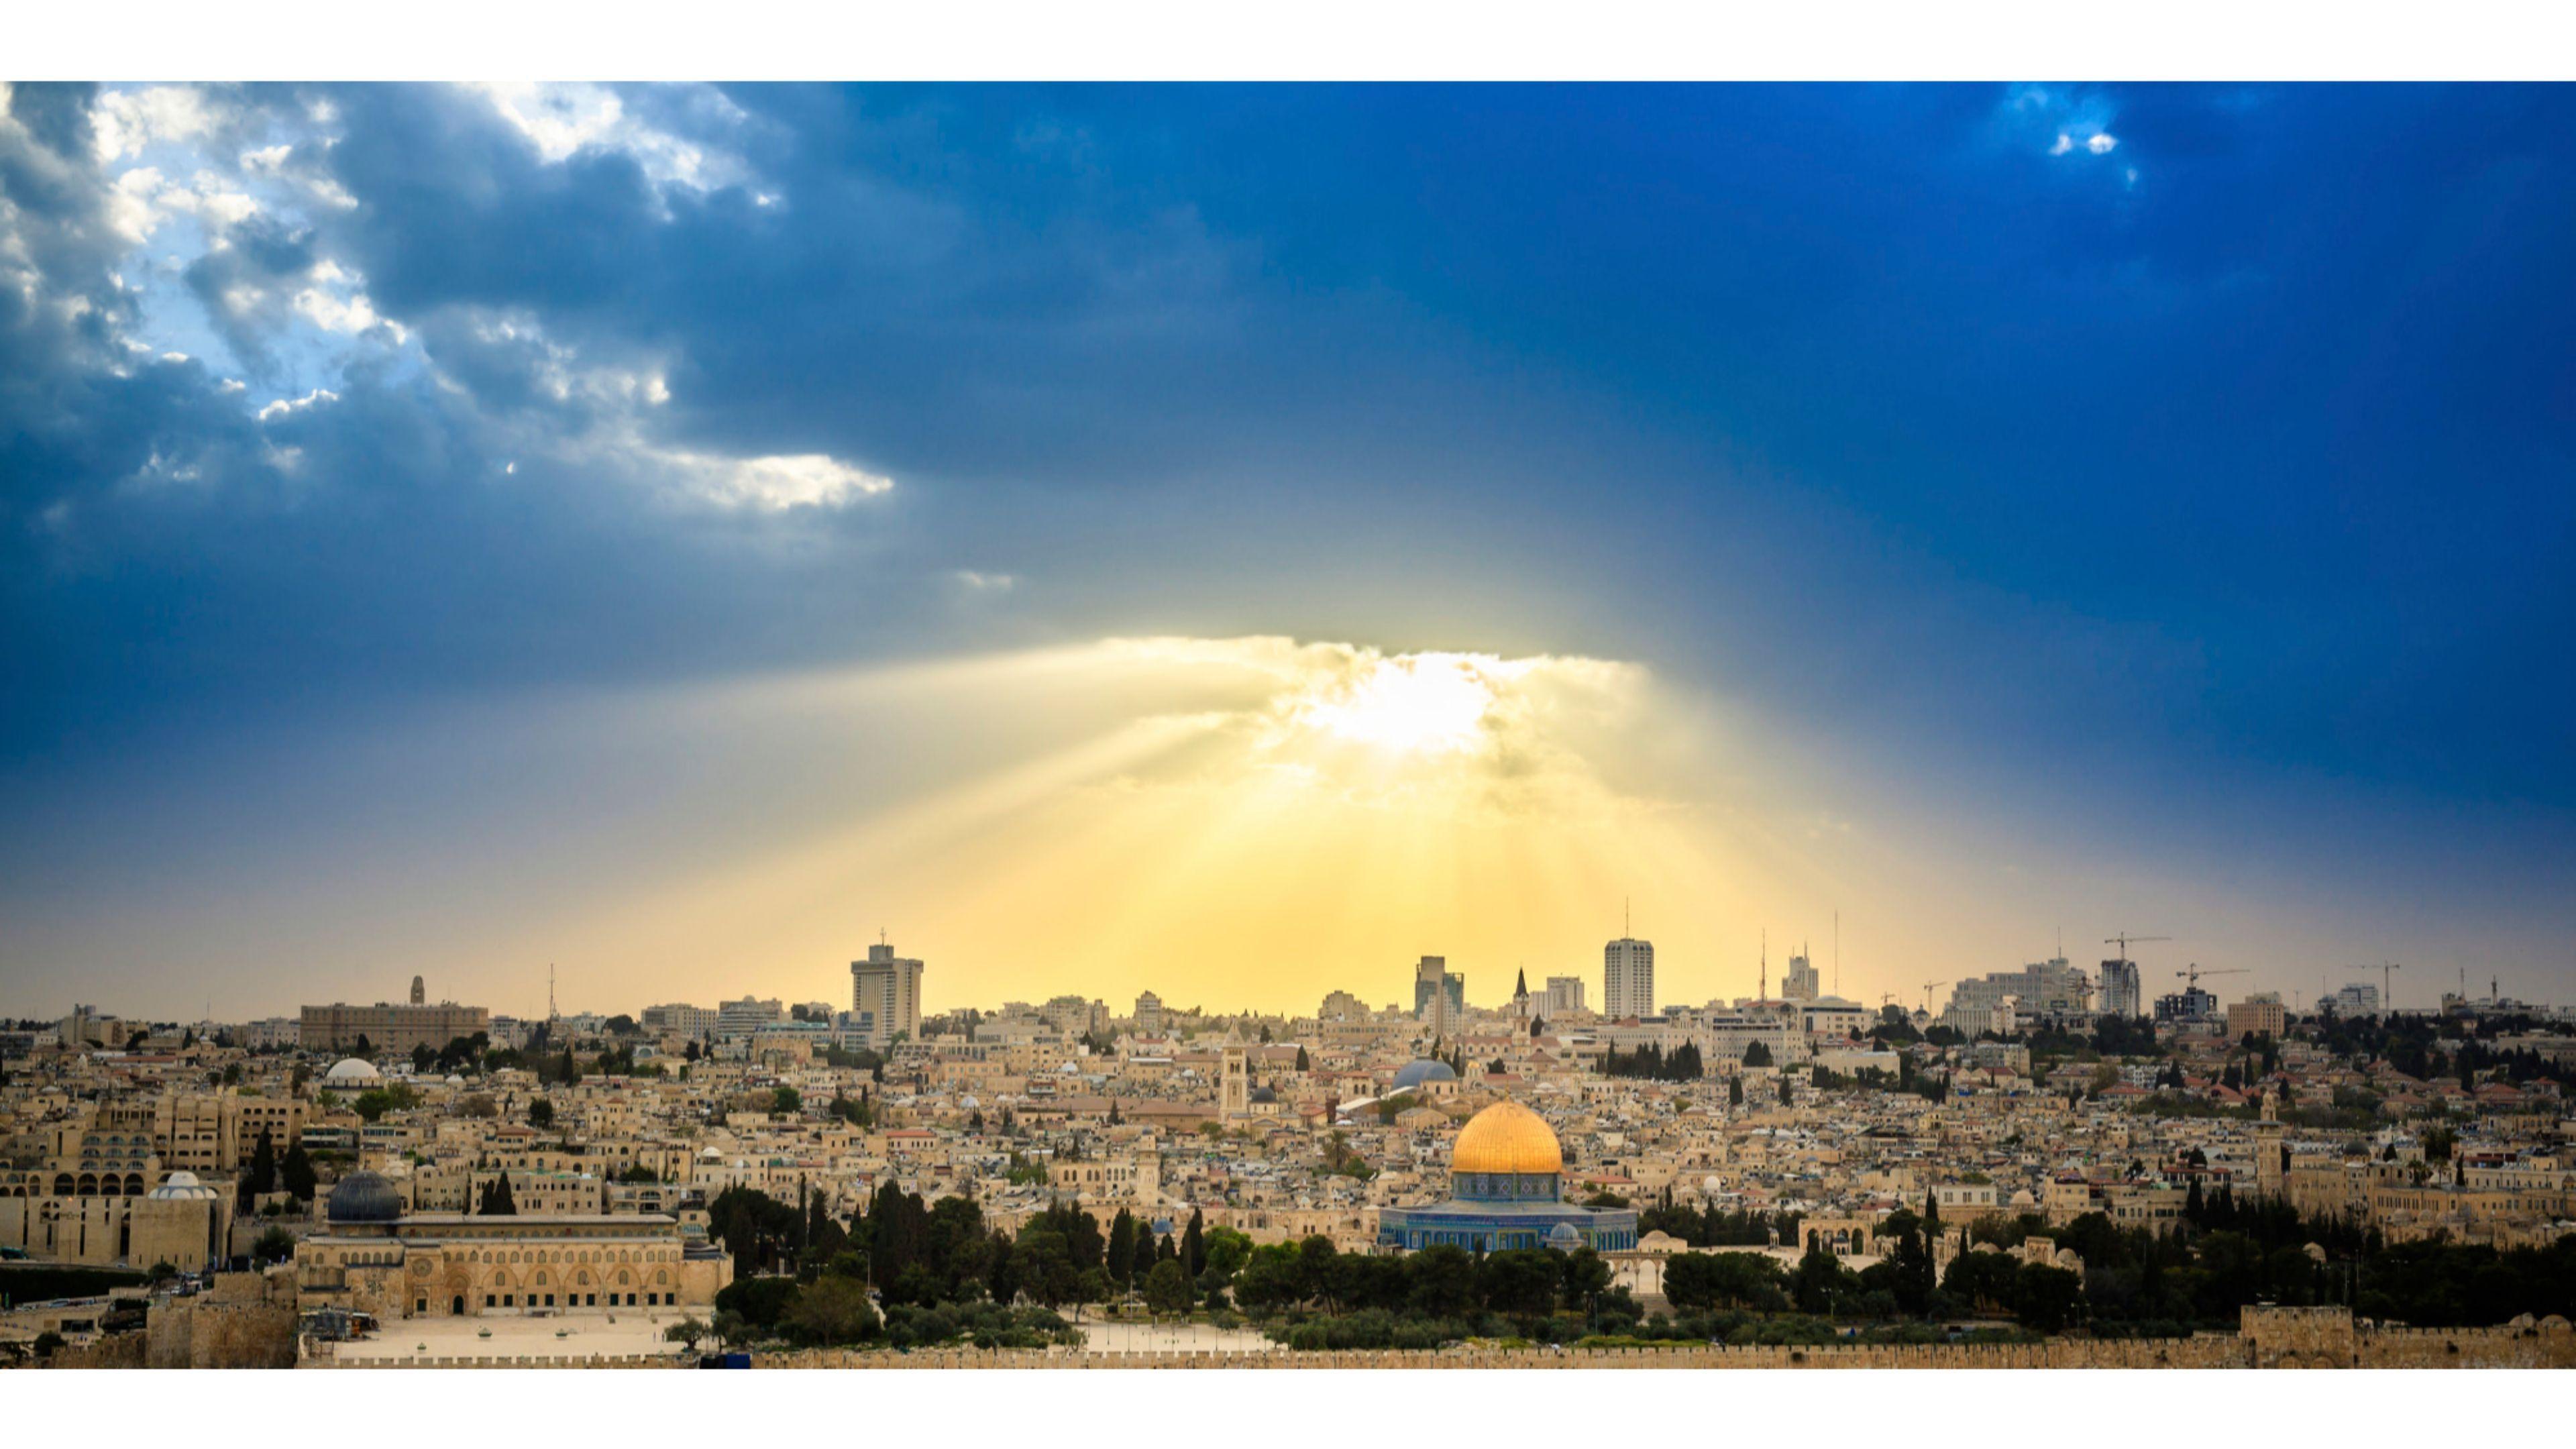 Jerusalem Wallpaper 21   3840 X 2160 stmednet 3840x2160